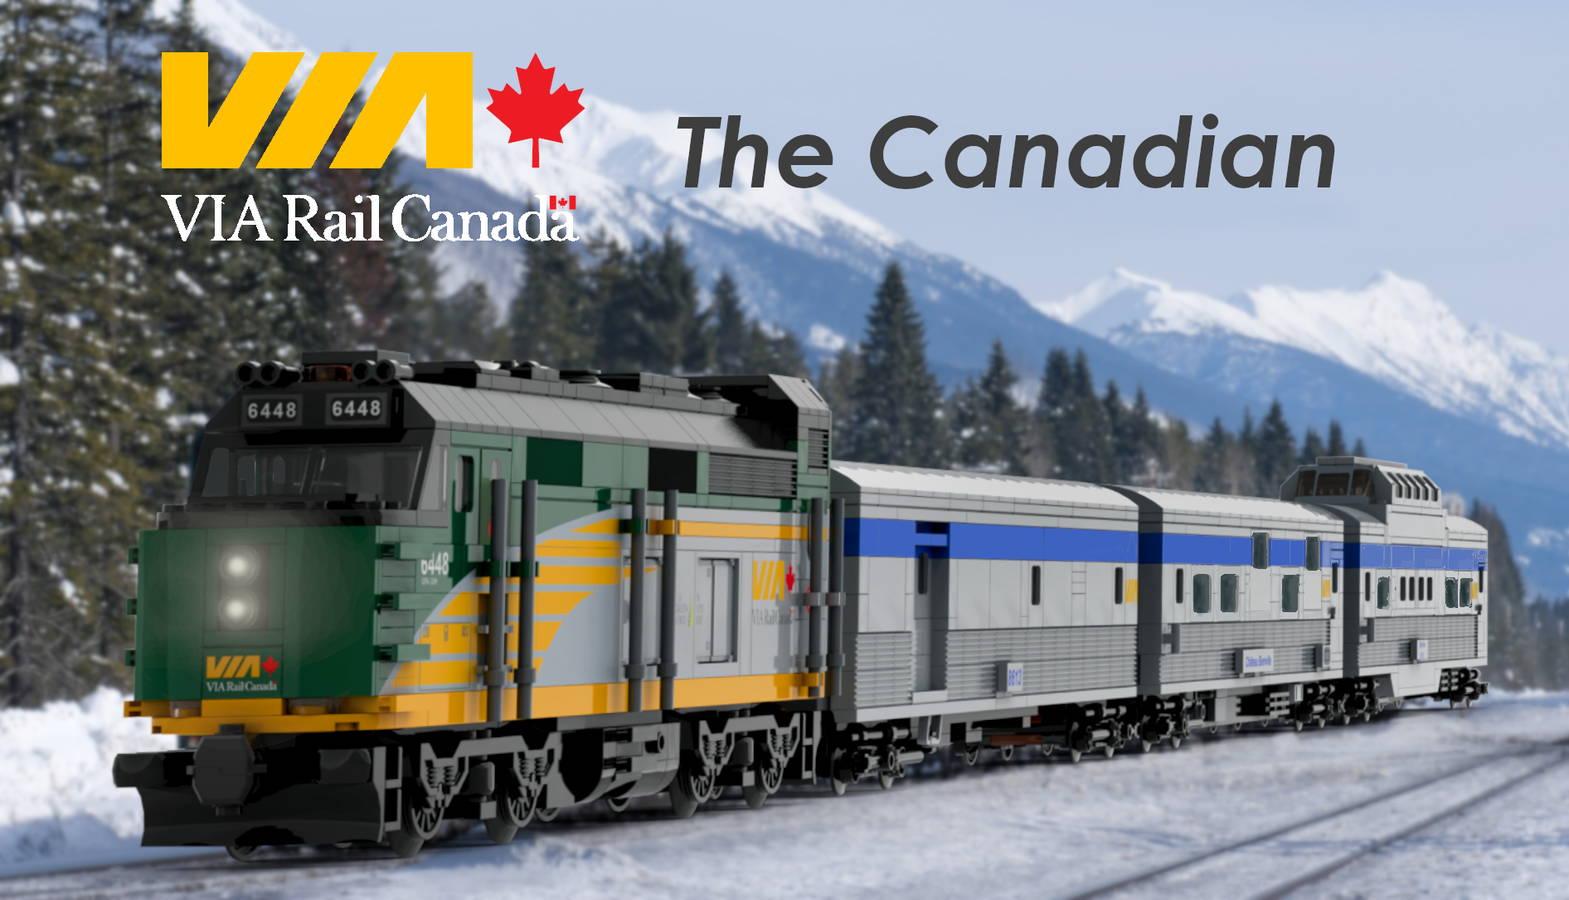 Via Rail Canada- Canadian